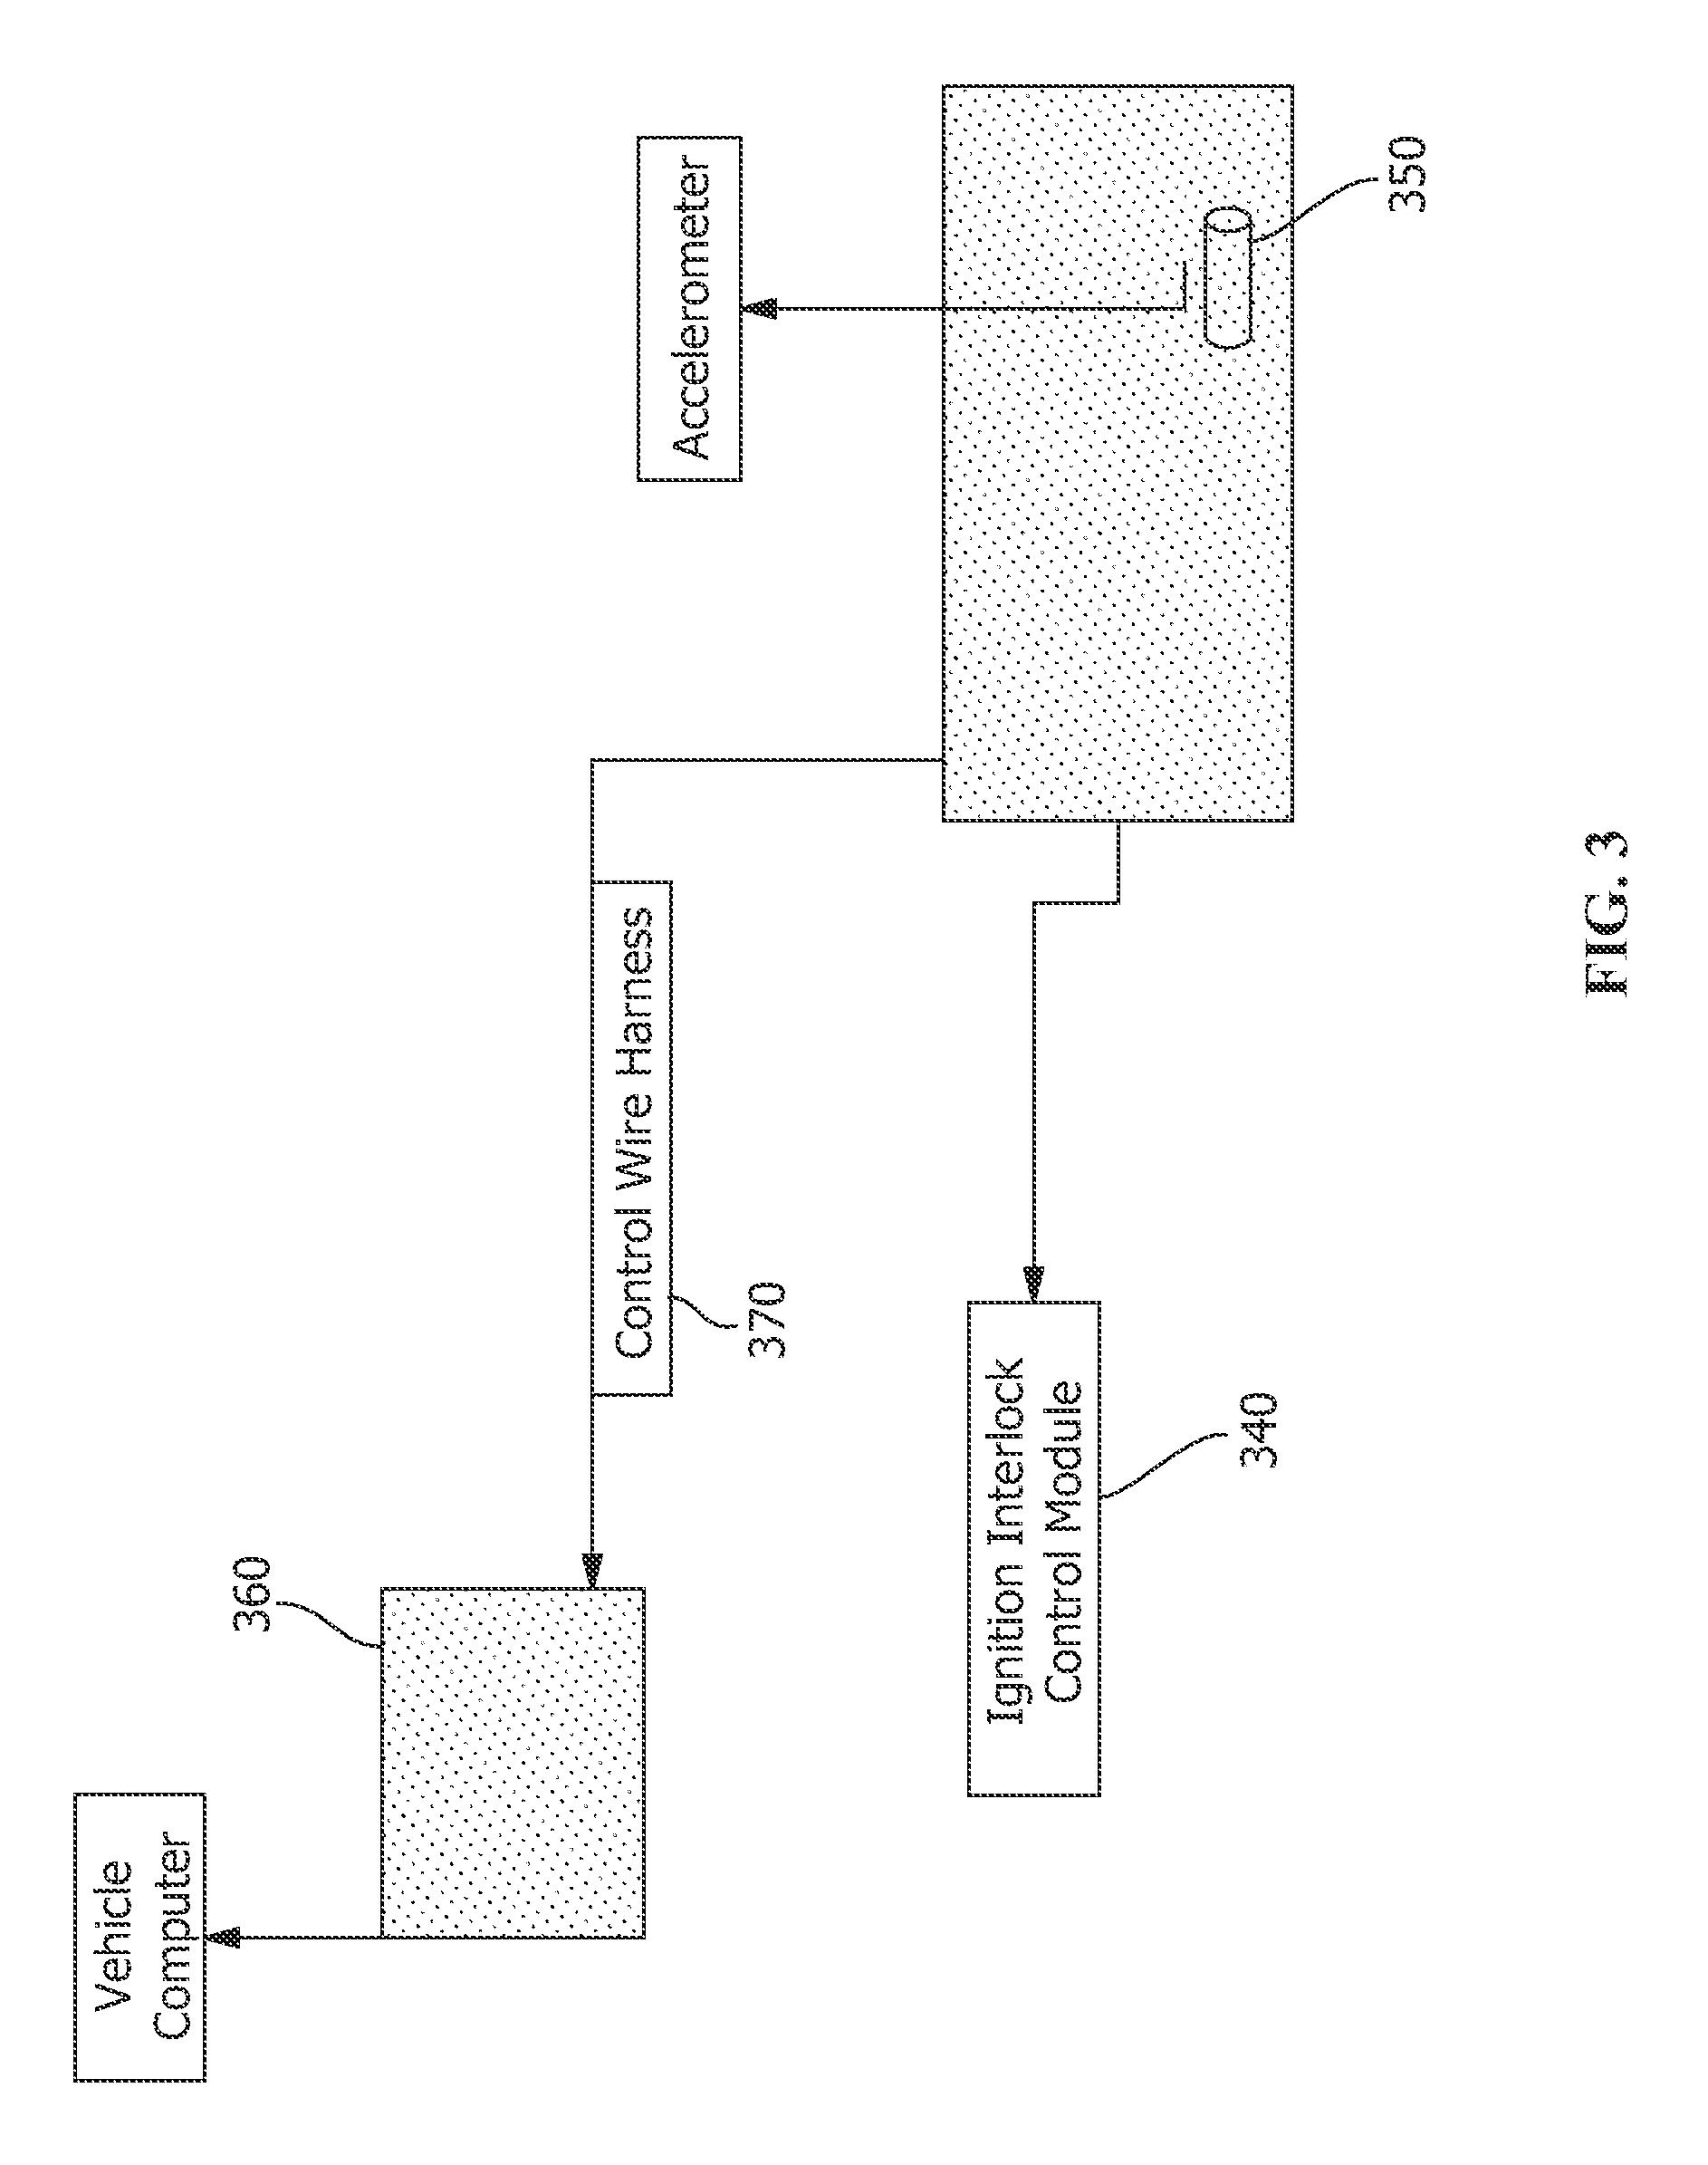 Wiring Diagram For Interlock Device